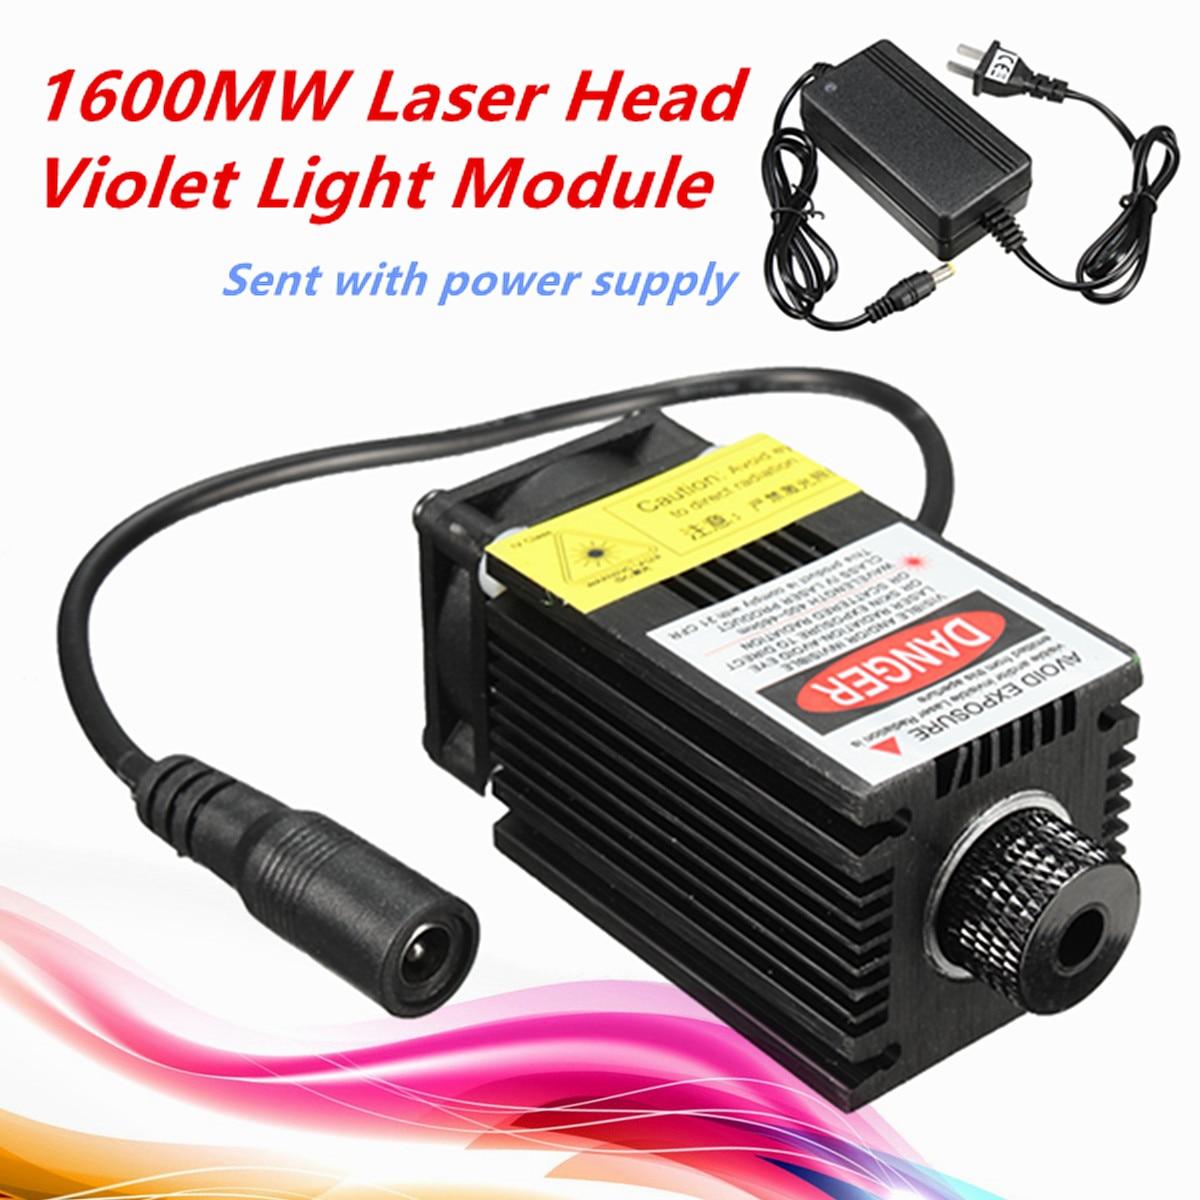 1600MW Blueviolet Light Laser Head laser Module Engraver Accessory for CNC laser Carving Engraving Machine Meatal Printing